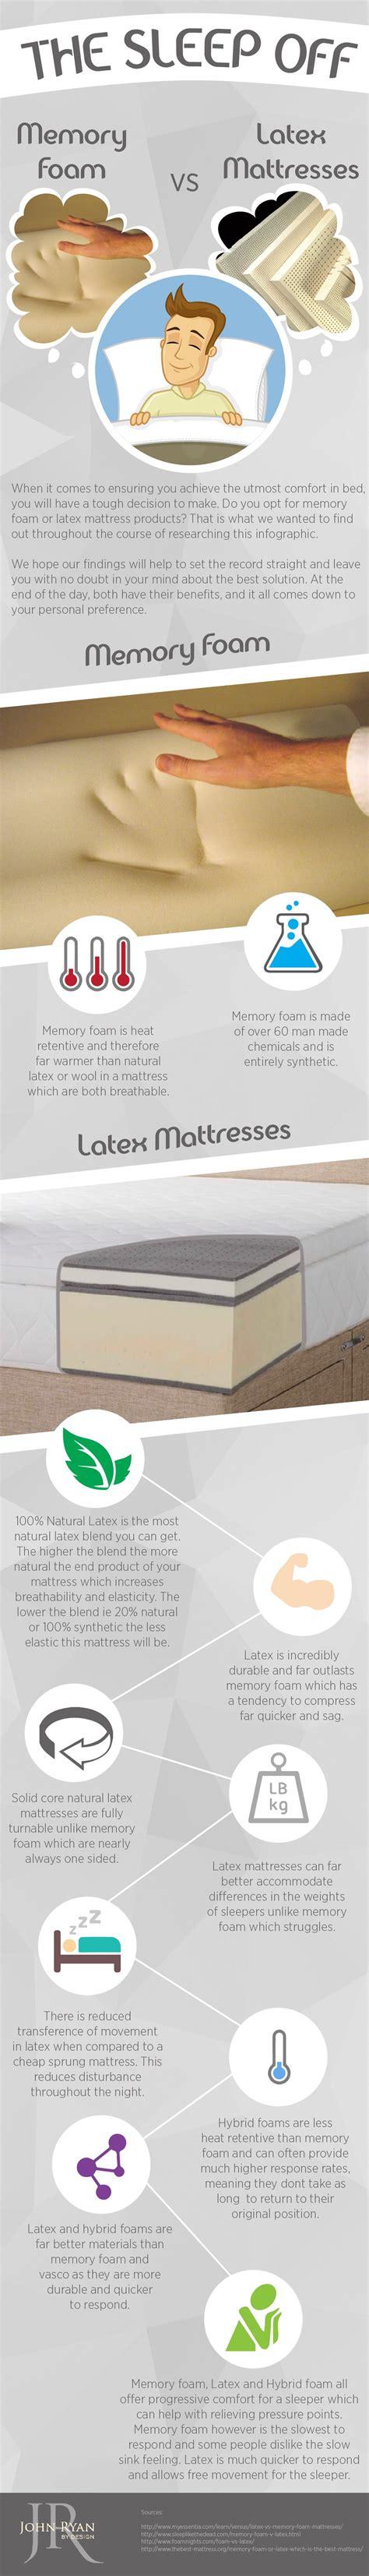 Mattresses Vs Memory Foam by Memory Foam Mattress Guide By Design